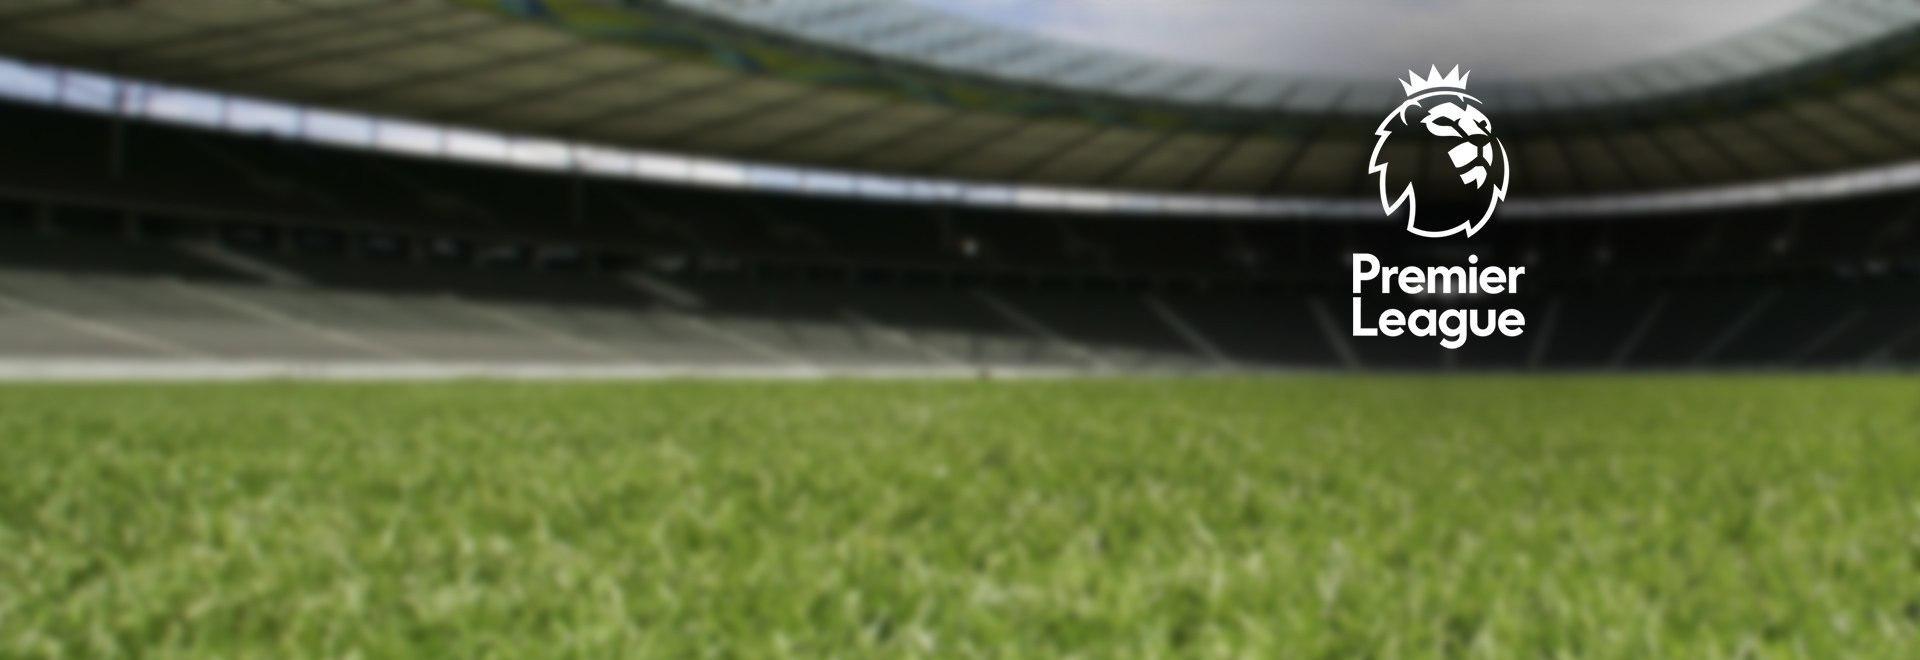 Aston Villa - Fulham. 30a g.